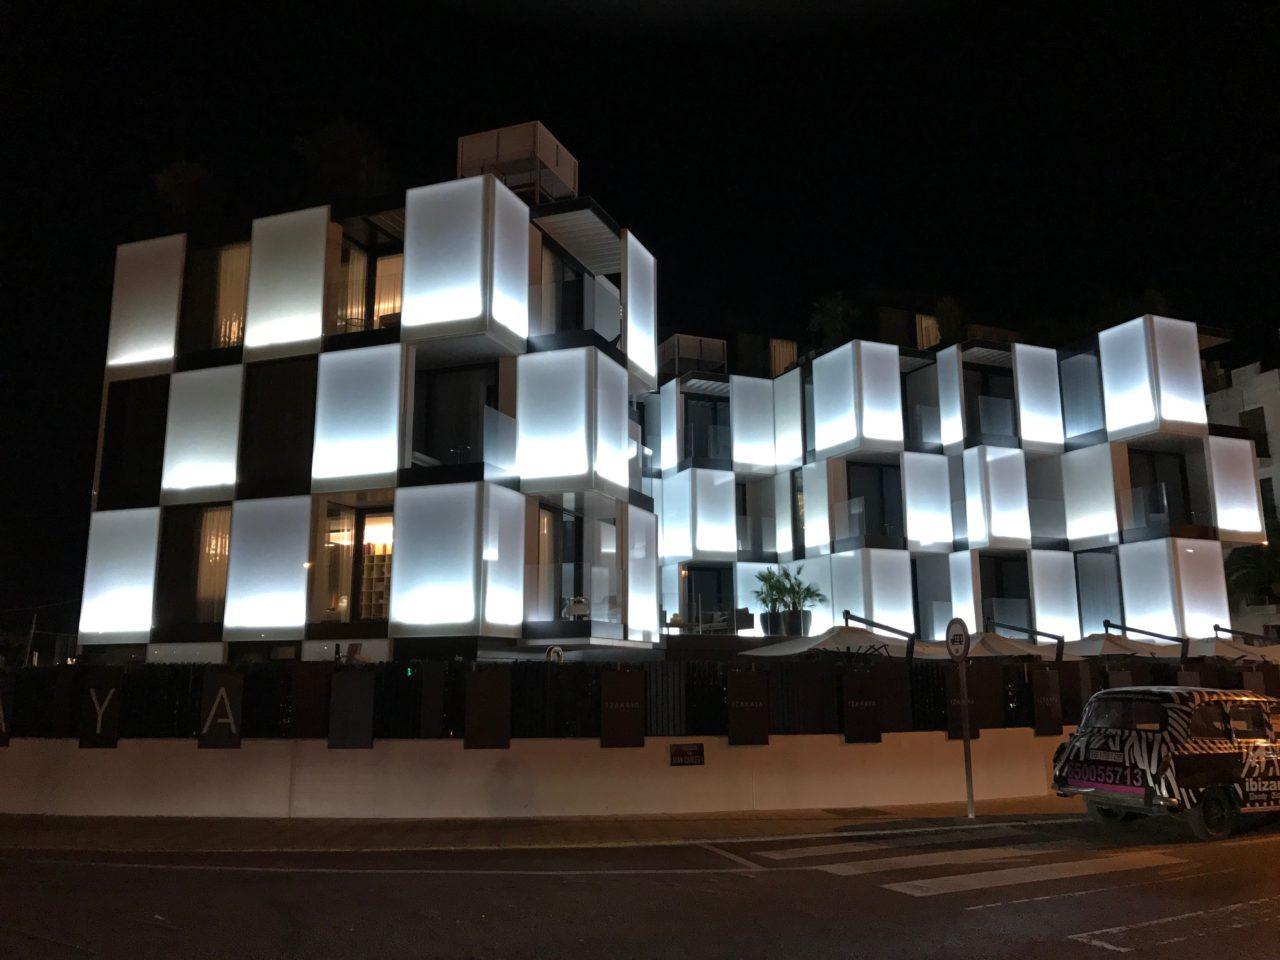 Glowing Futuristic Square Hotel Window Lights